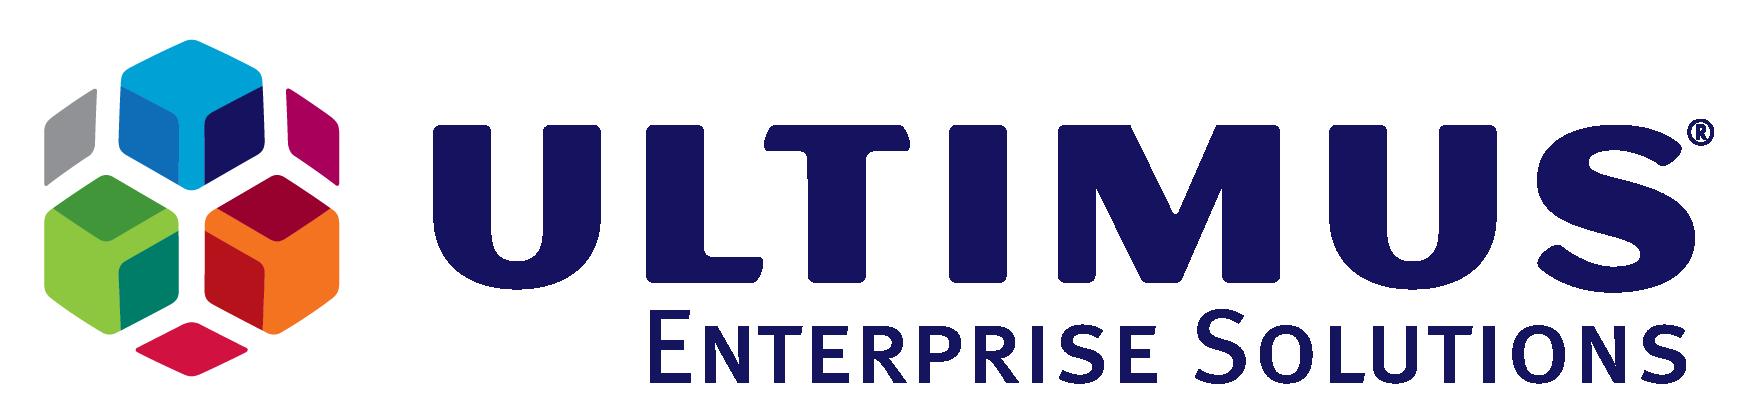 Ultimus Enterprise BPM Solutions